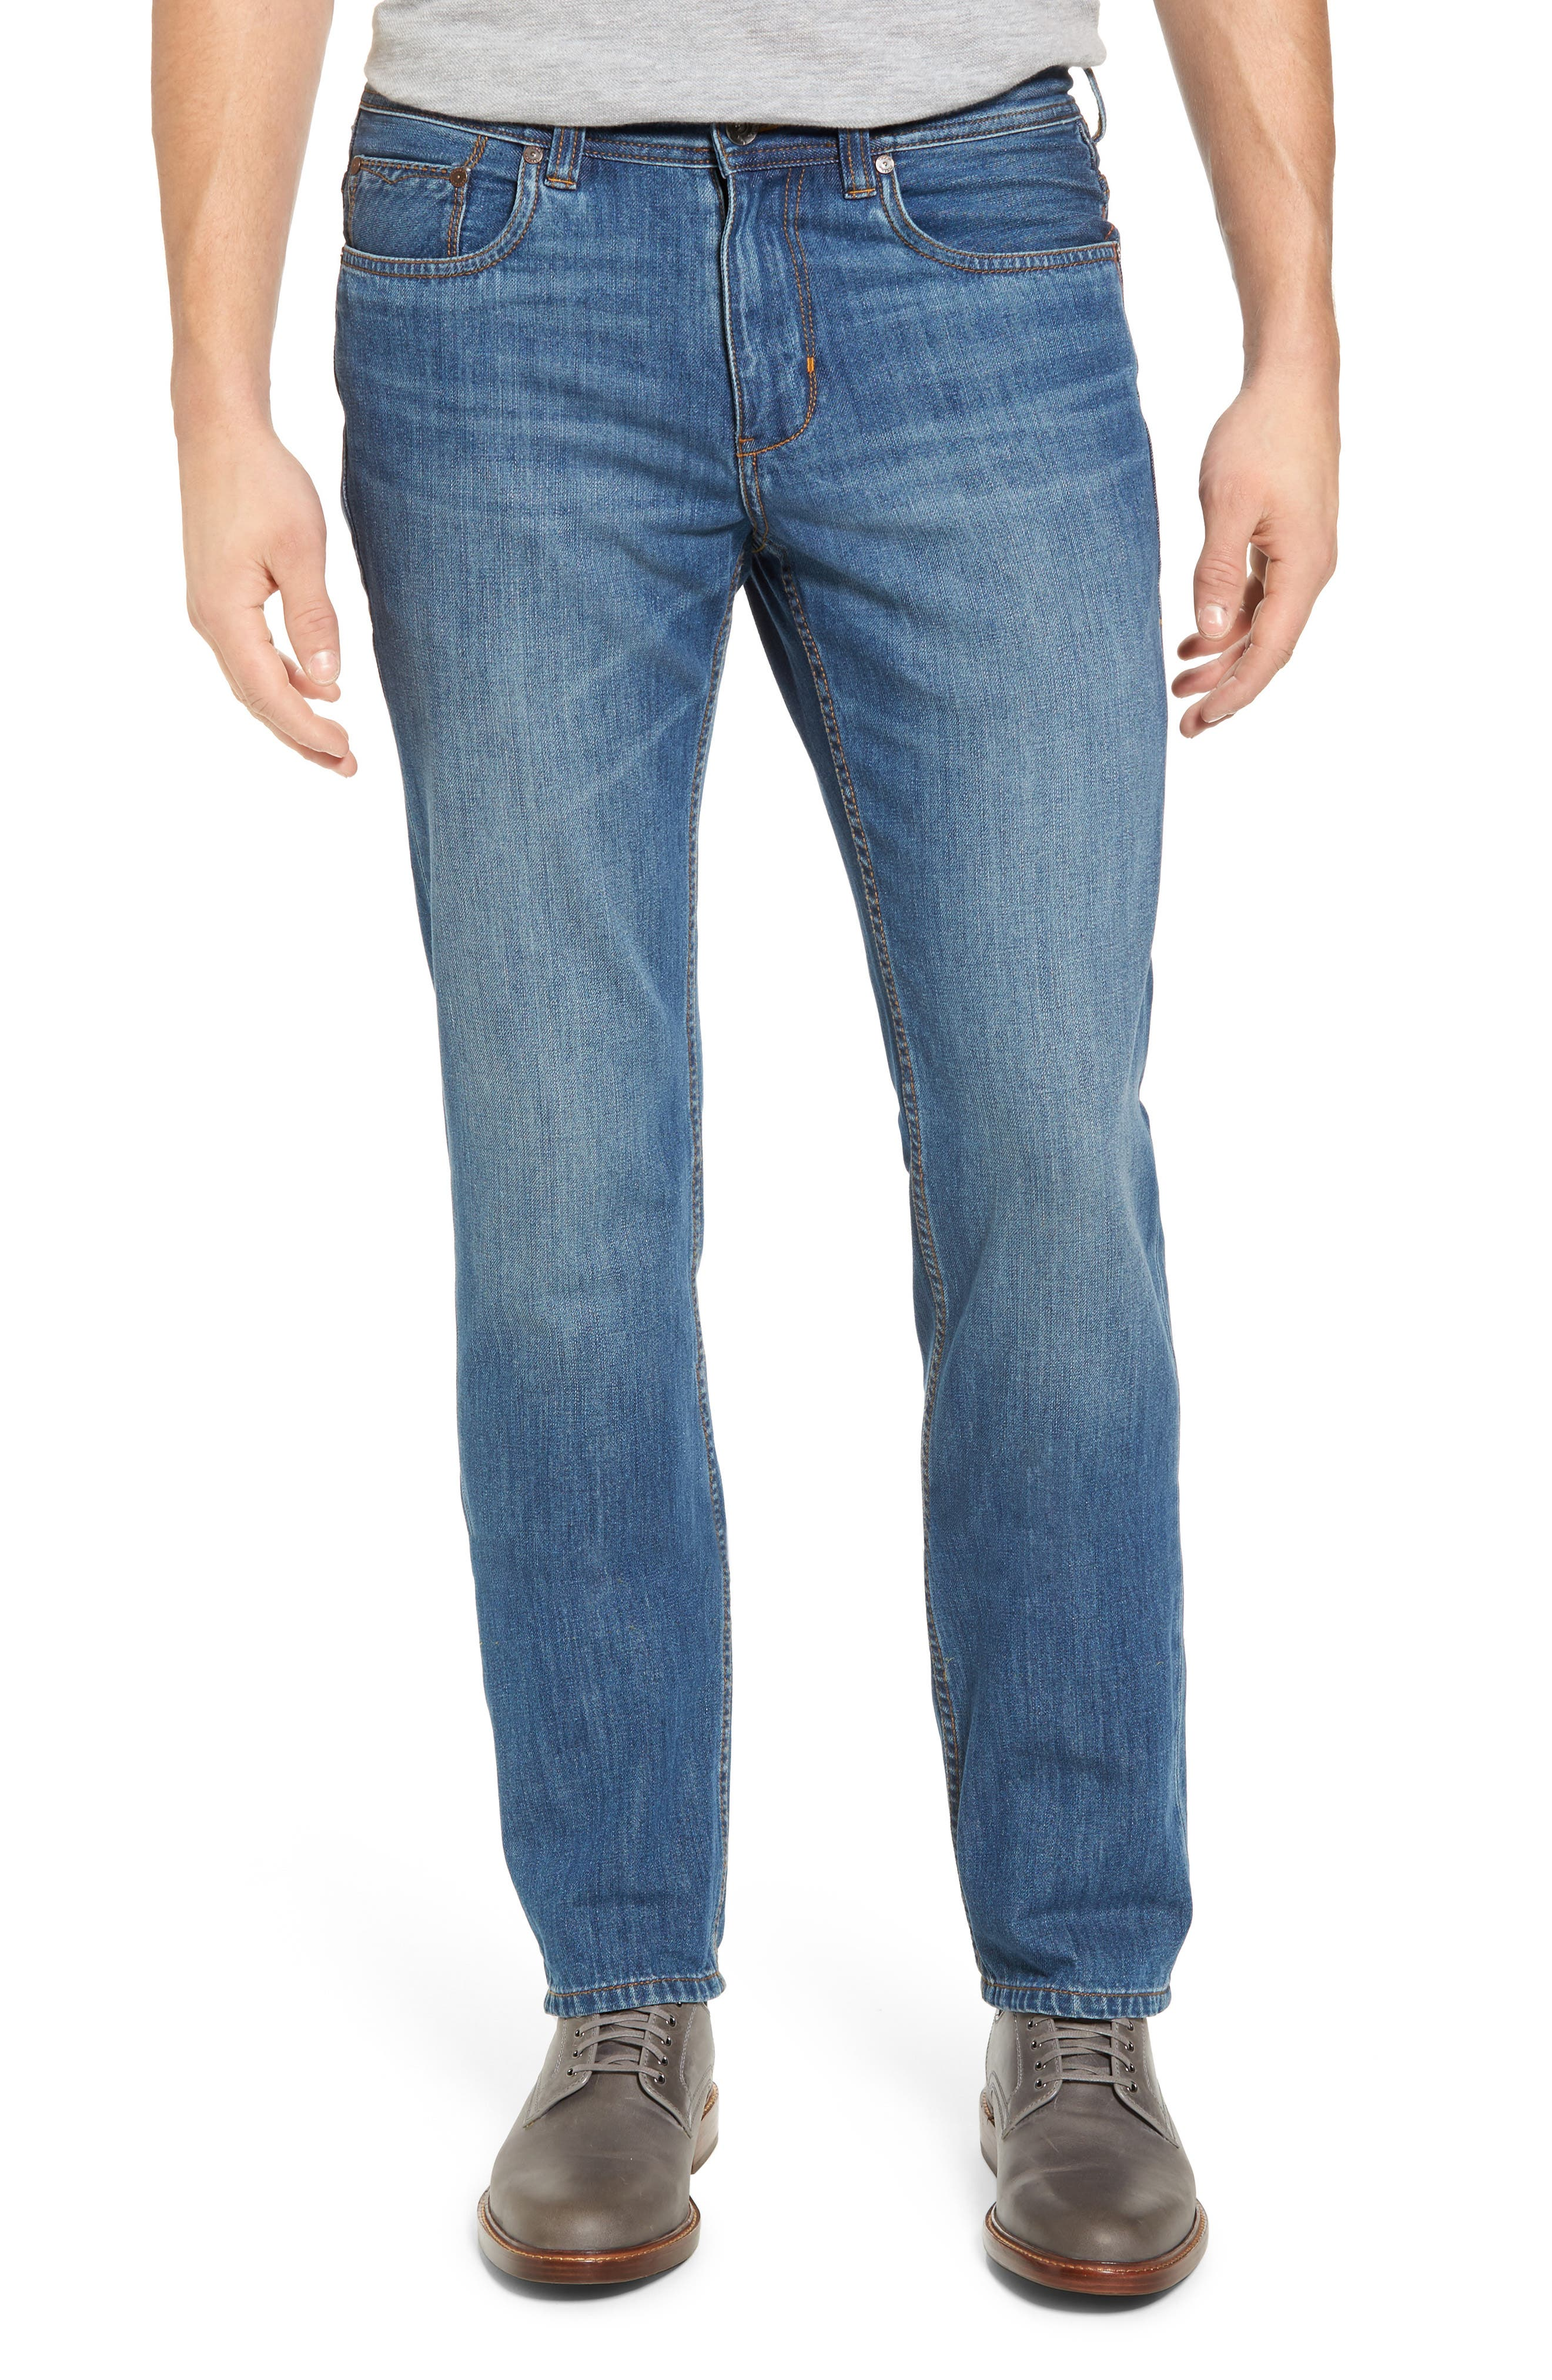 Bardabos Straight Leg Jeans,                             Main thumbnail 1, color,                             400